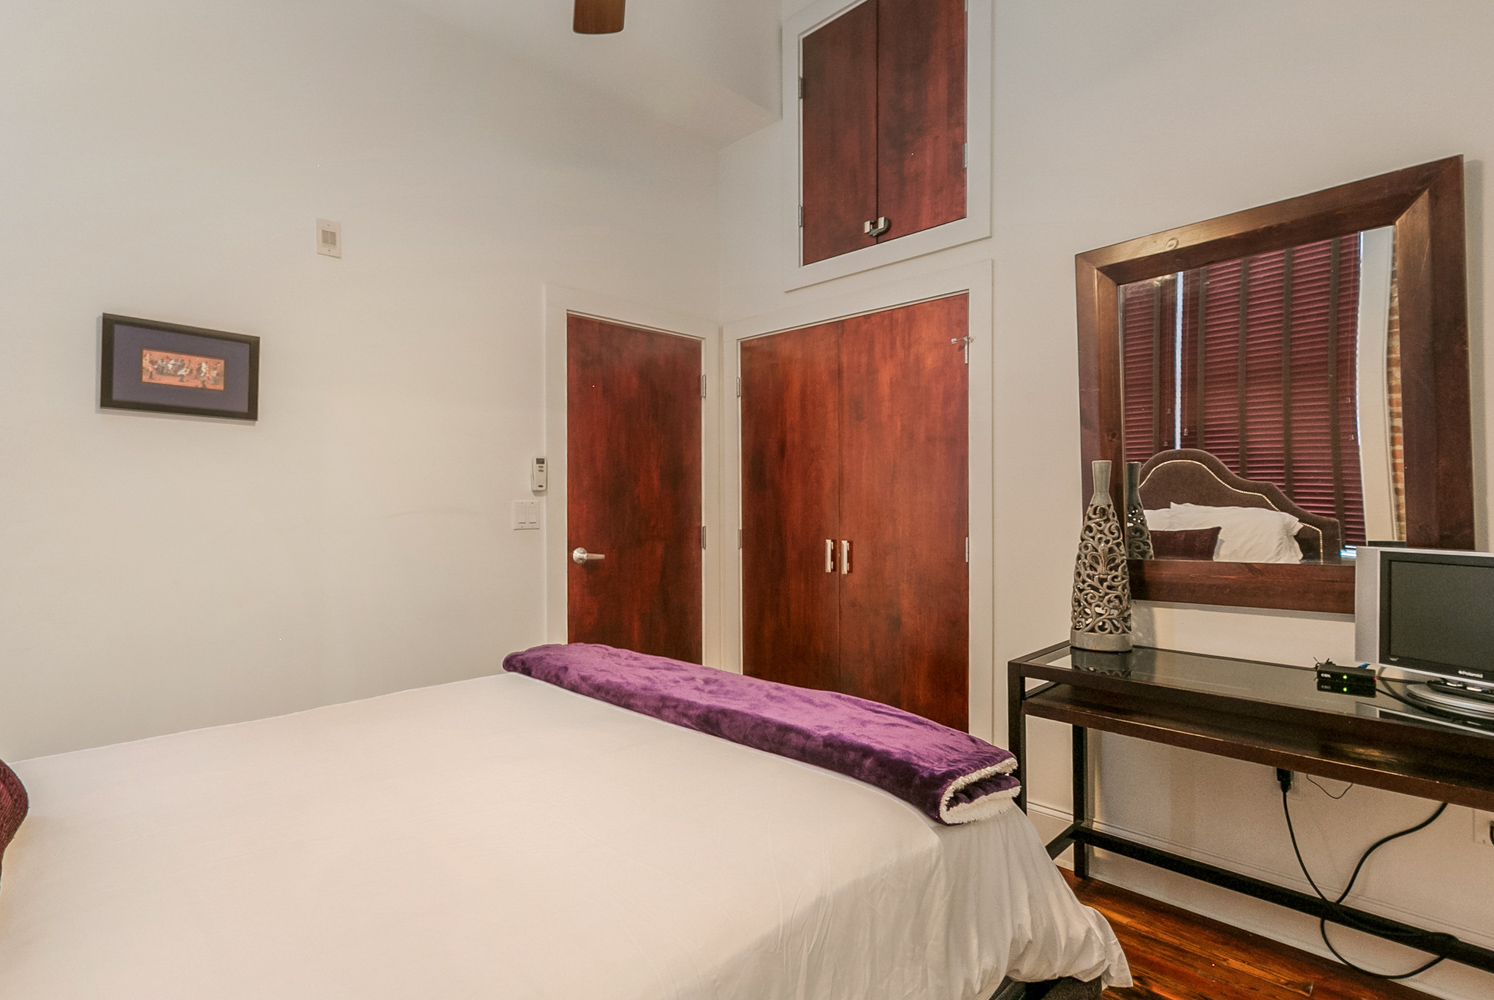 Lower Garden District, Condo, 2 beds, 2.0 baths, $2500 per month New Orleans Rental - devie image_10